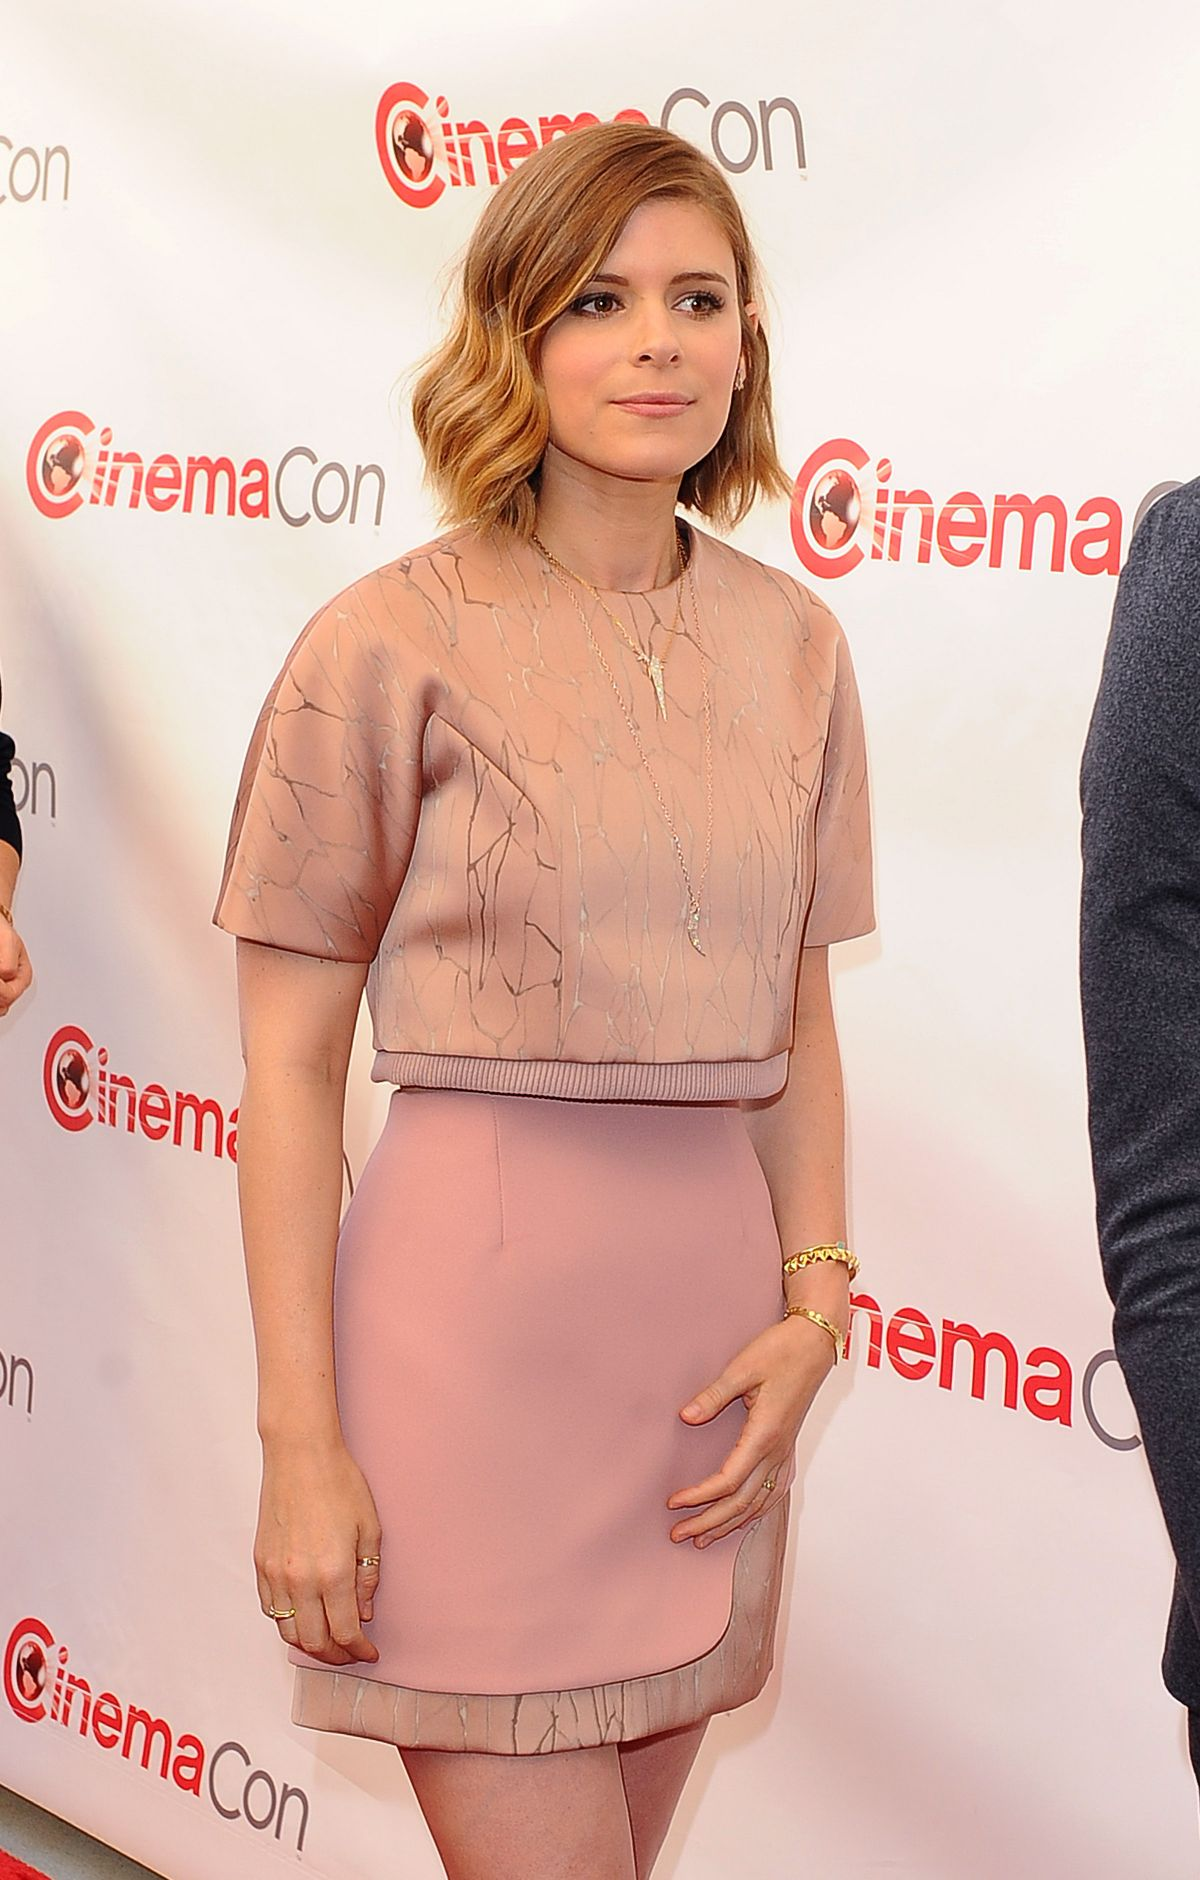 KATE MARA at 20th Century Fox Presentation at Cinemacon in Las Vegas